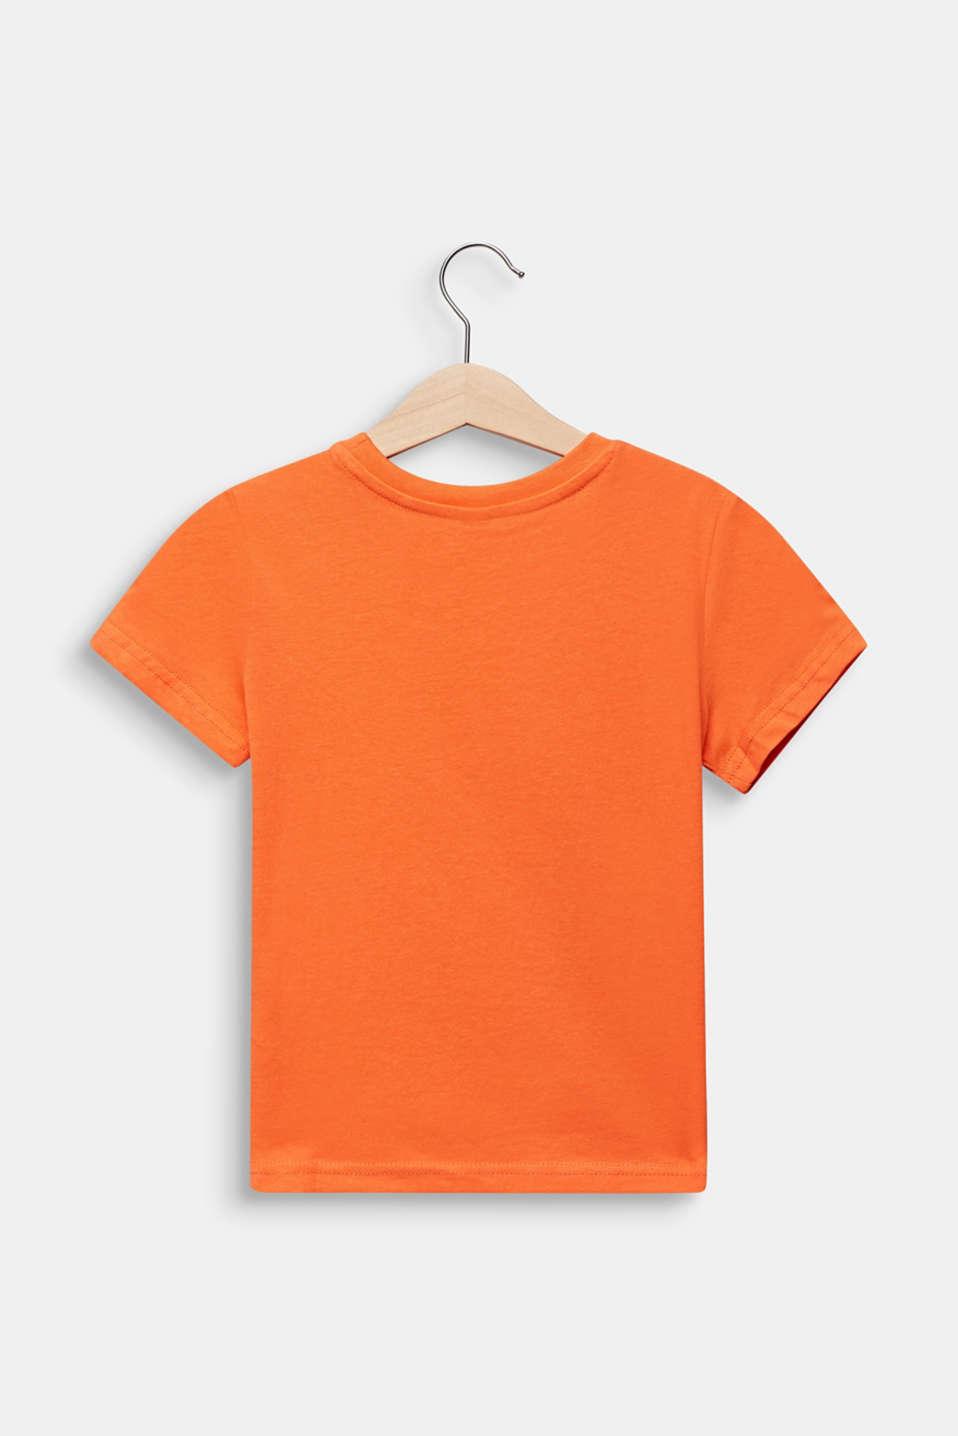 Printed T-shirt, 100% cotton, SUNNY ORANGE, detail image number 1